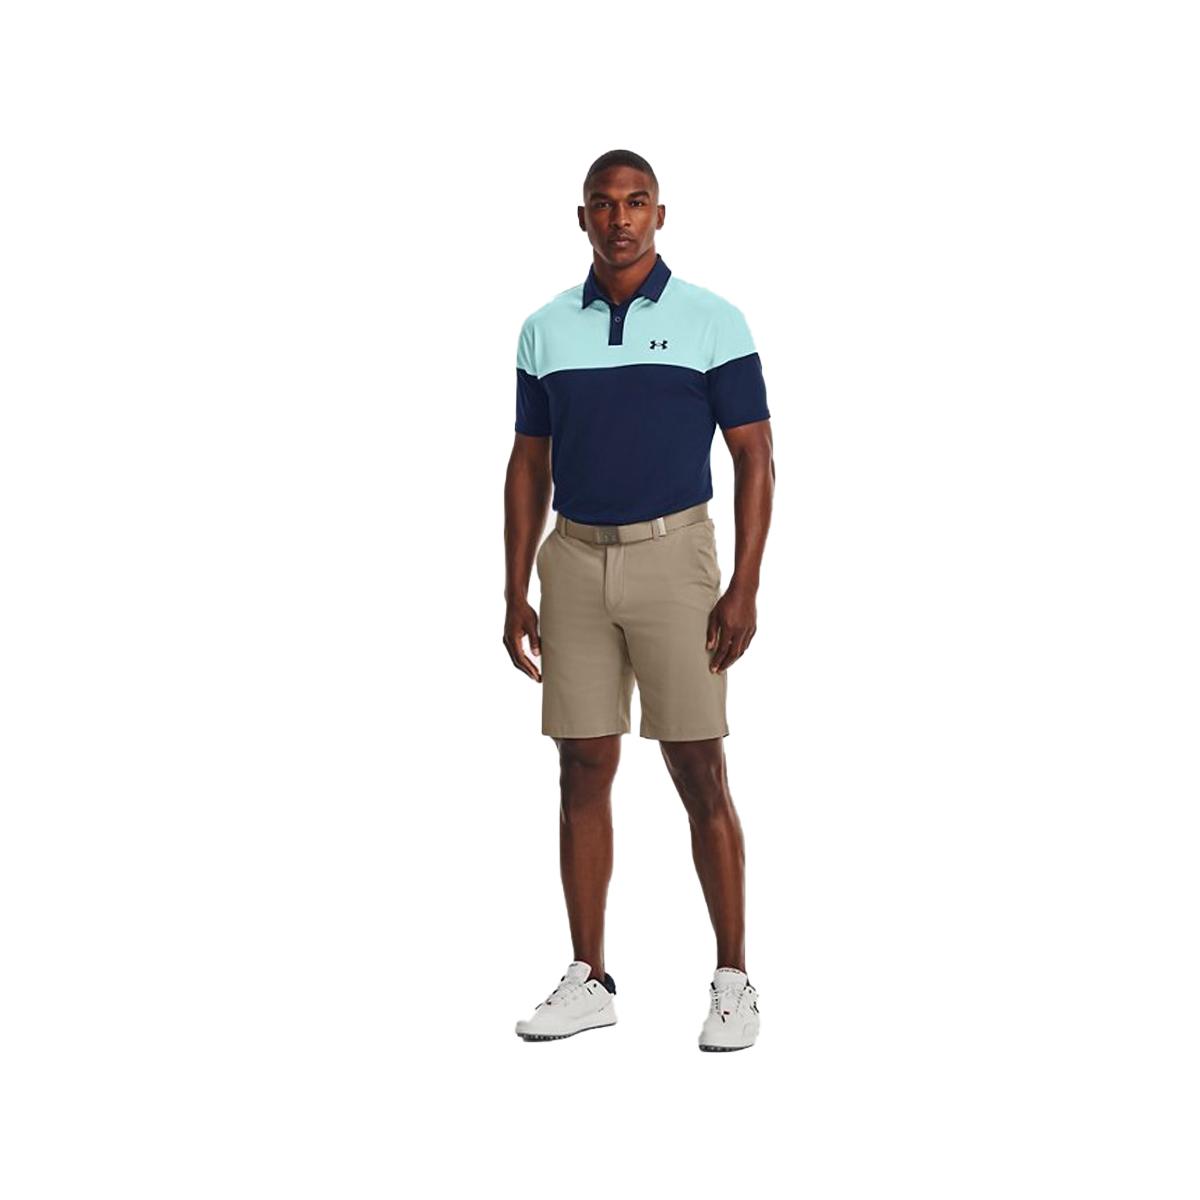 Men's T2G Blocked Polo Shirt, Lt Blue/Blue, swatch